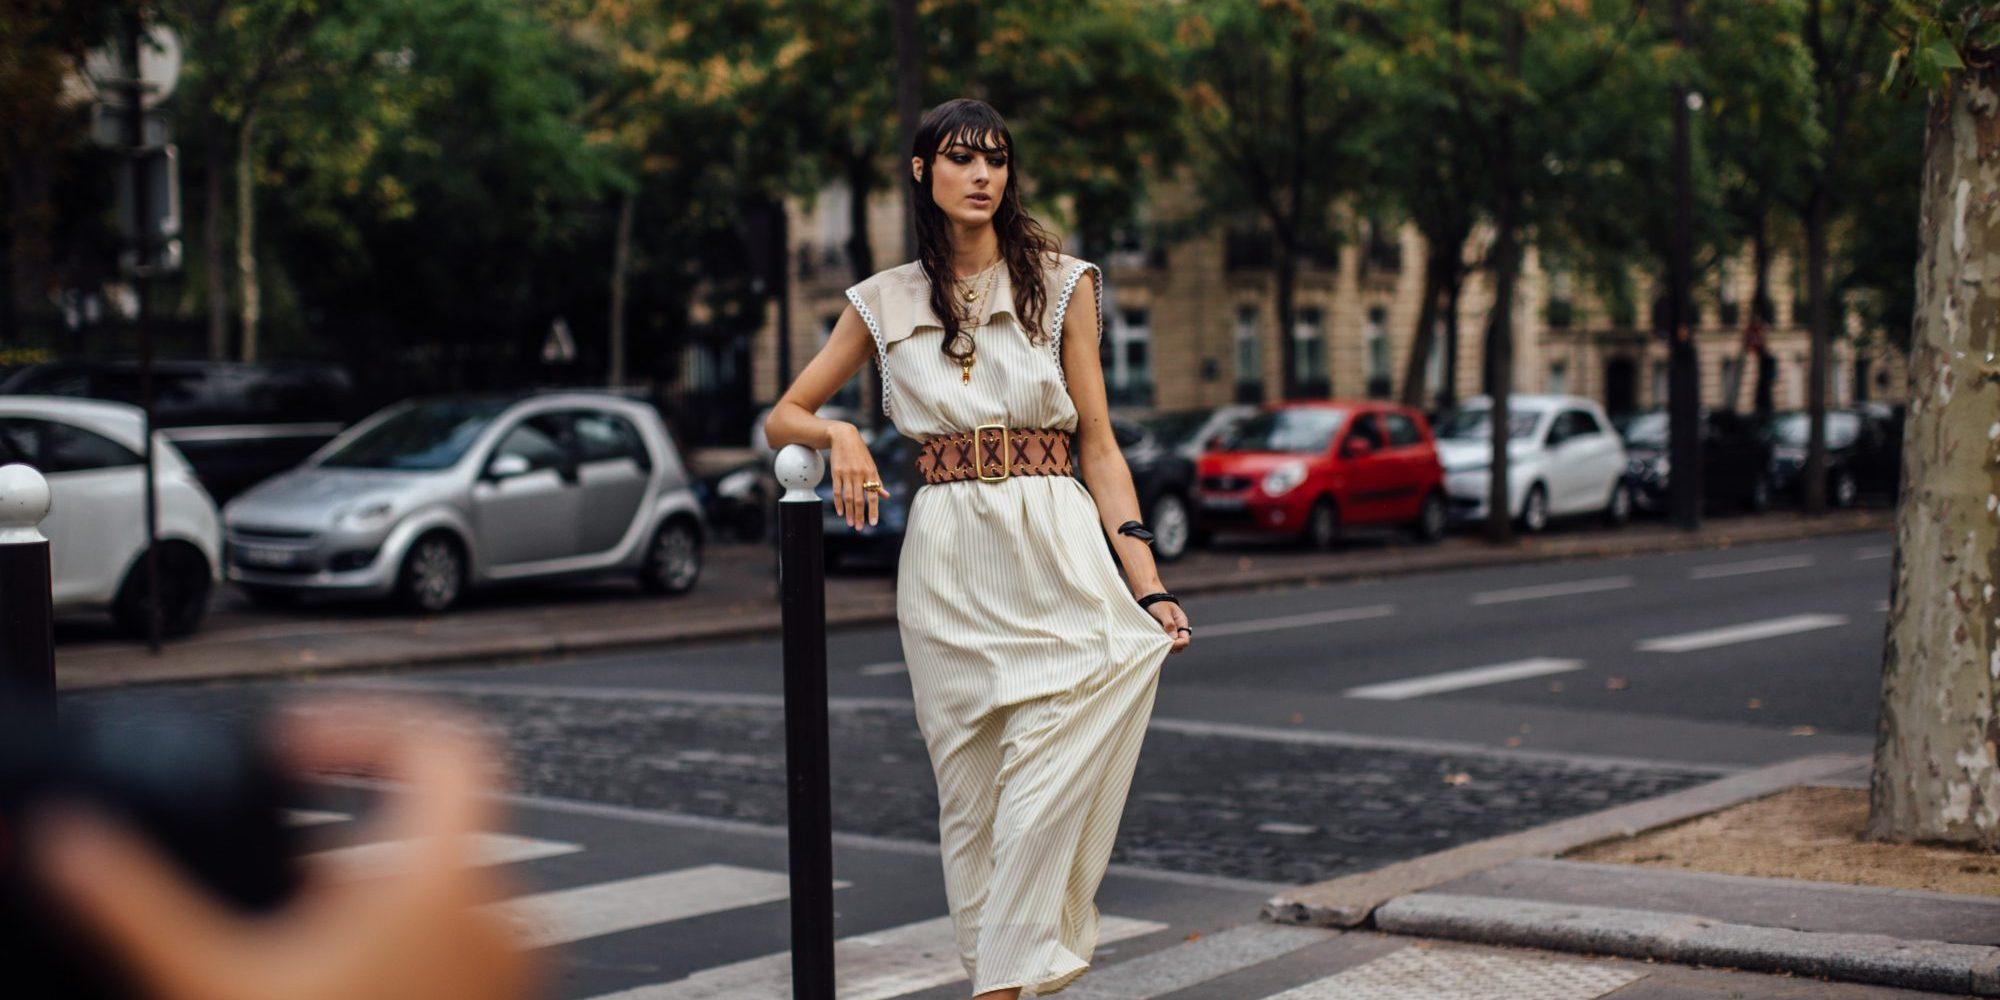 Parisian Chic: Οι τάσεις που αγαπούν τώρα οι Παριζιάνες (και εμείς)